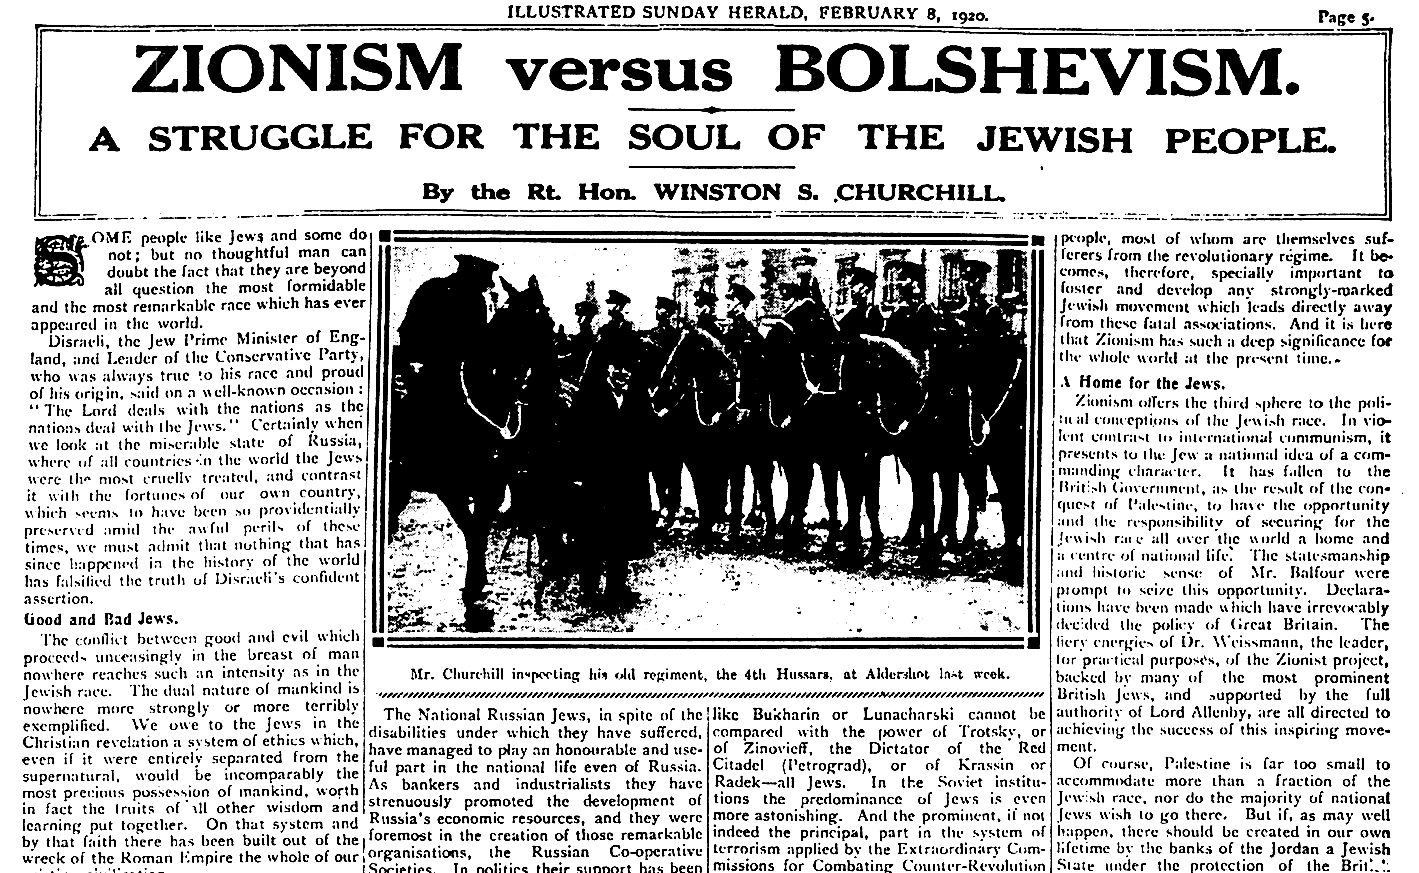 Zionism Versus Bolshevism